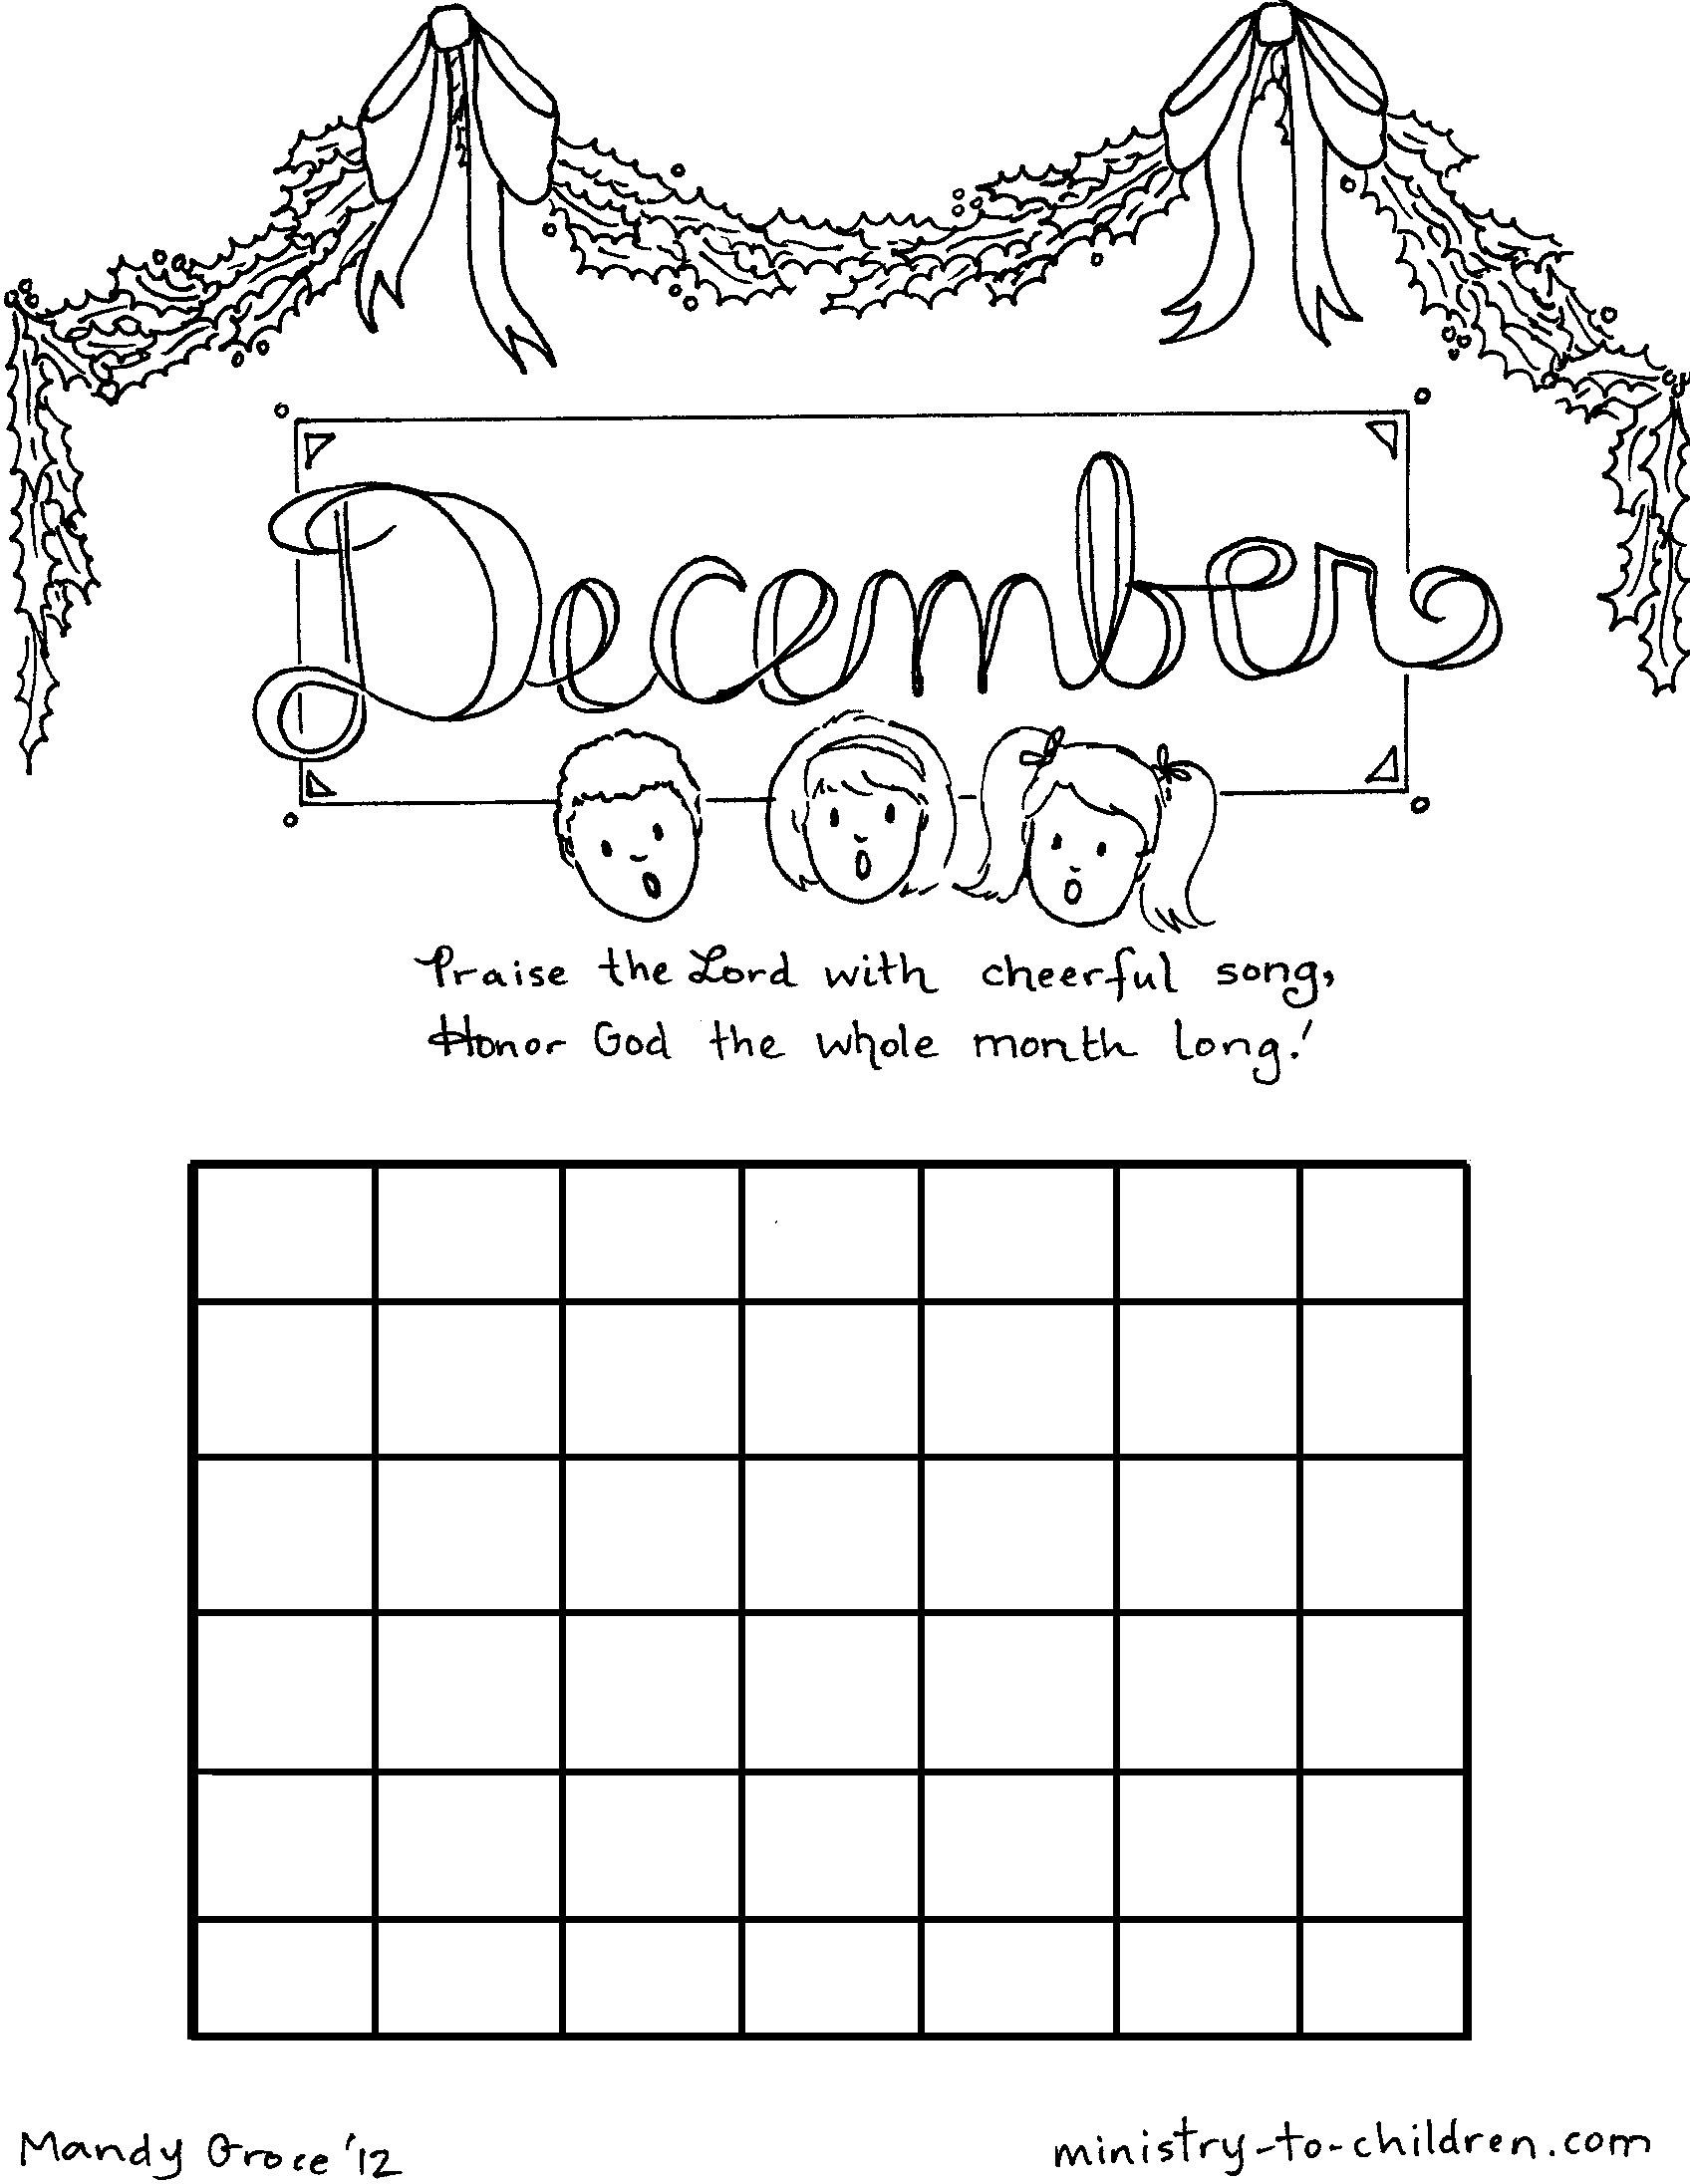 Free Printable Kids Coloring Calendar Sept